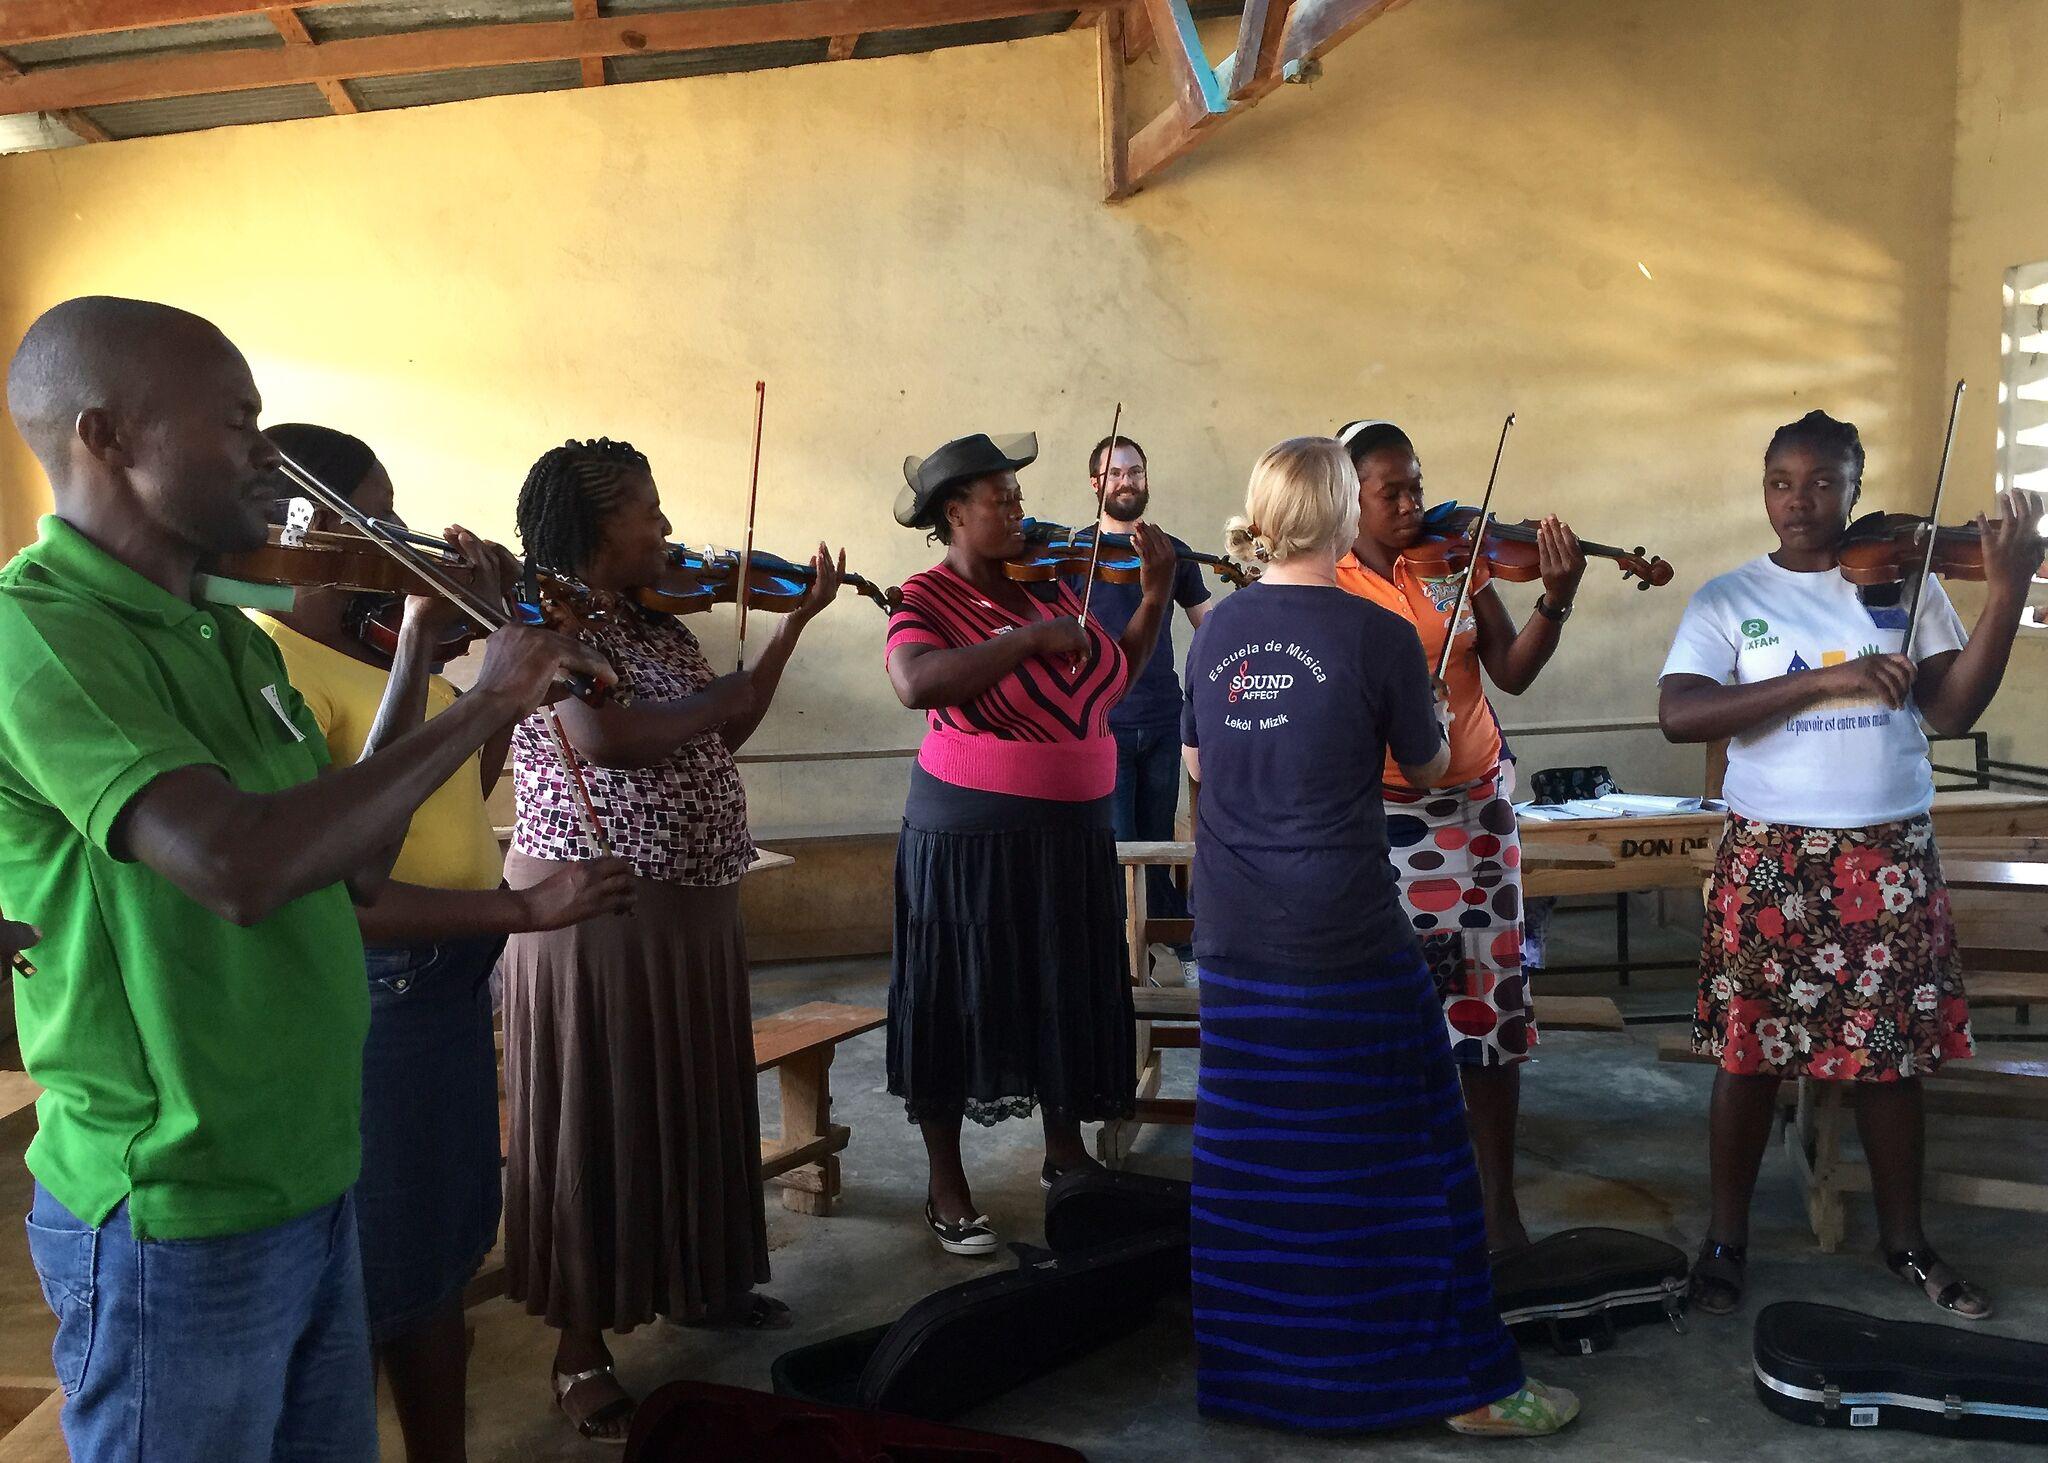 Mallory Alekna of Indiana University Conducts Violin Class in Haiti